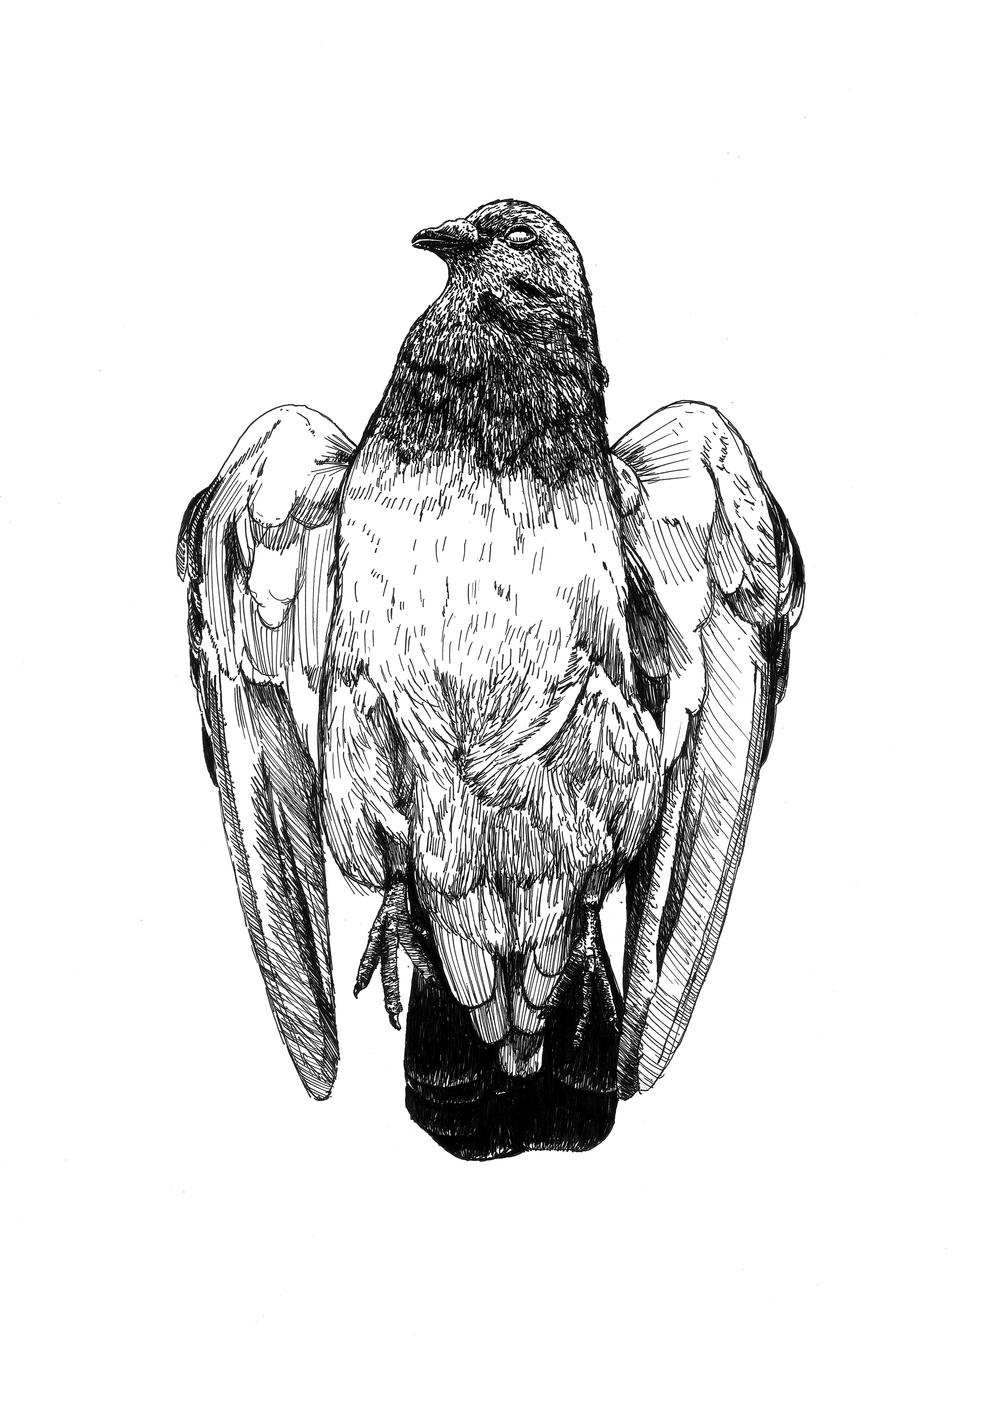 pigeon_scan_A4.jpg